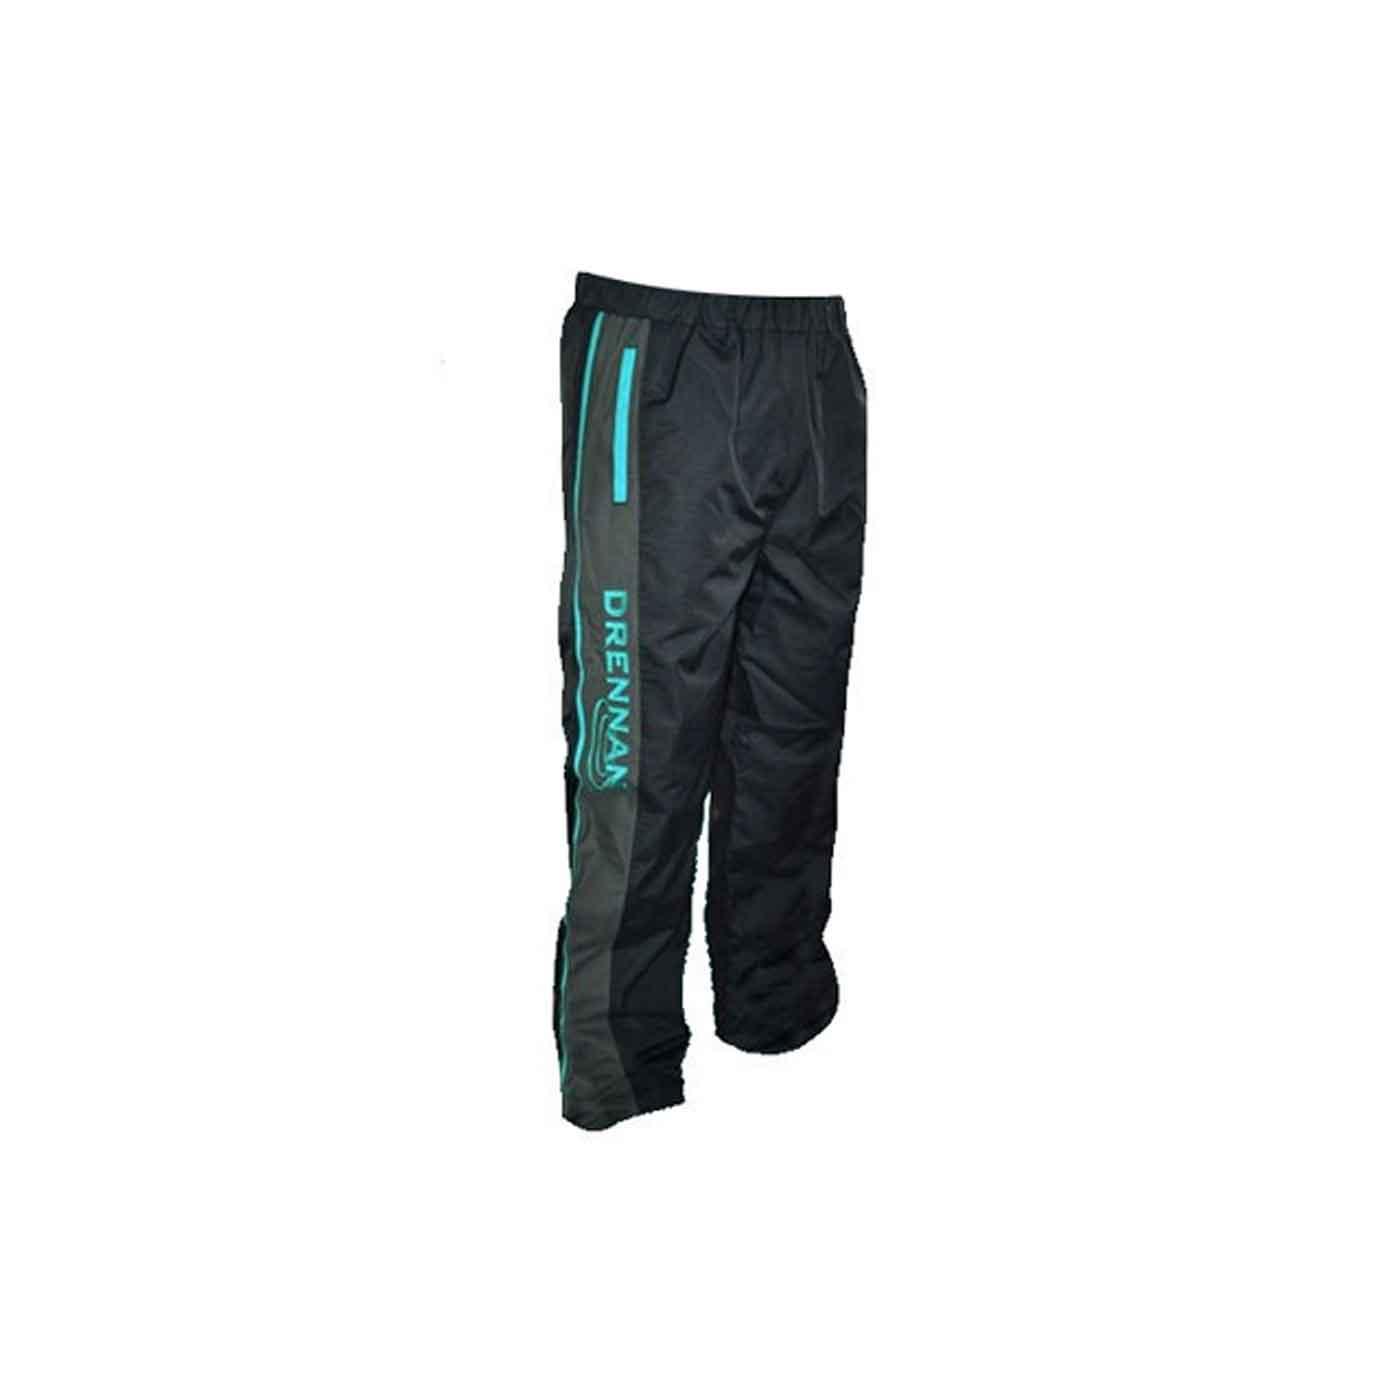 Drennan Waterproof Trousers